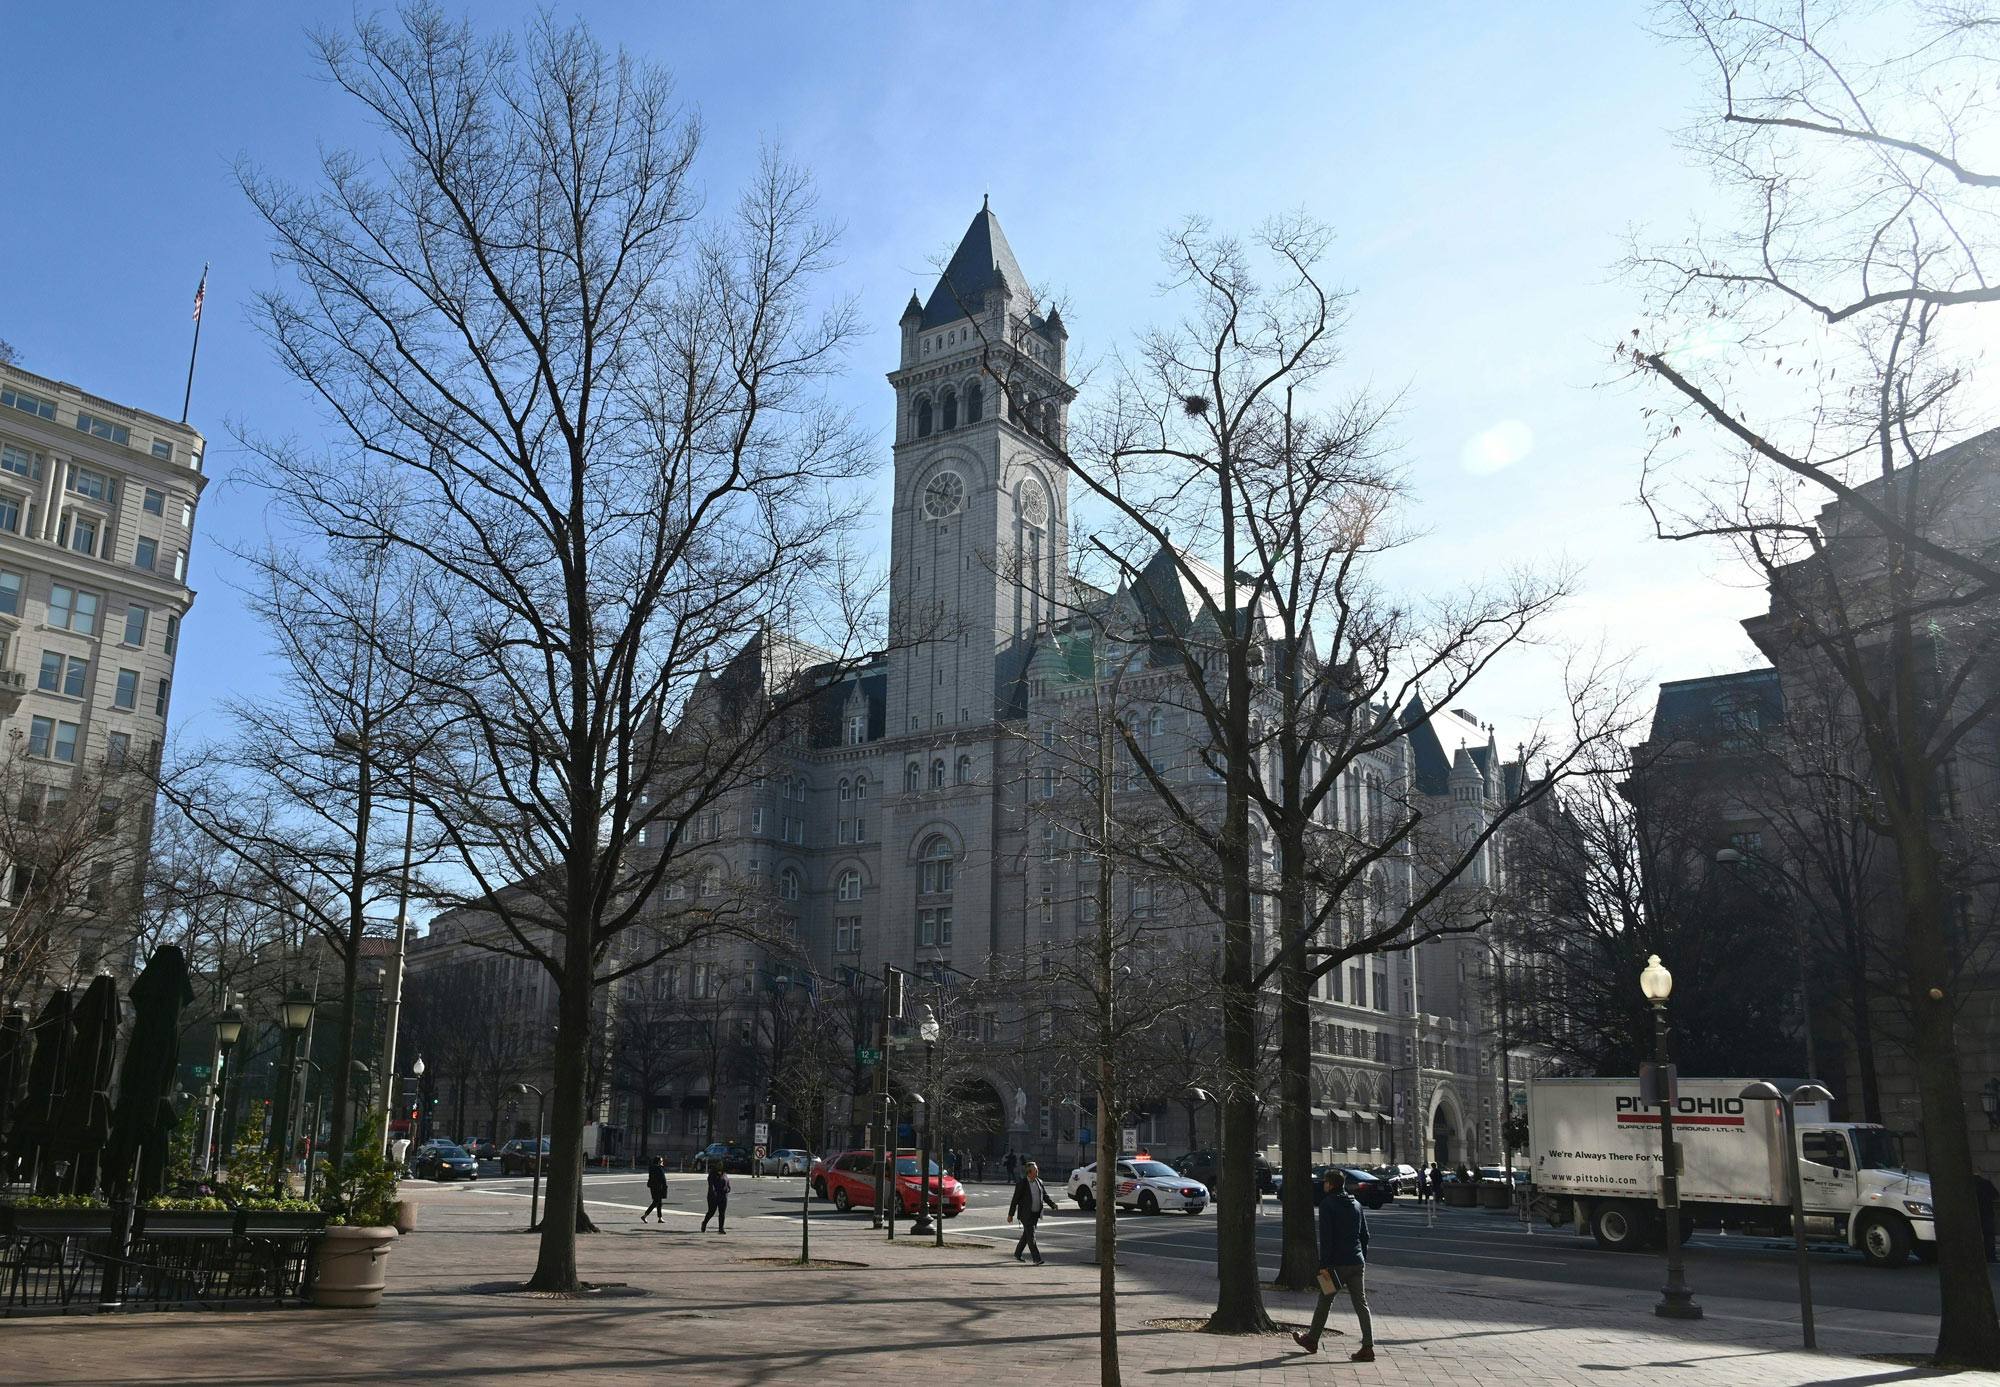 The Trump International Hotel is seen in Washington, DC, on January 15.